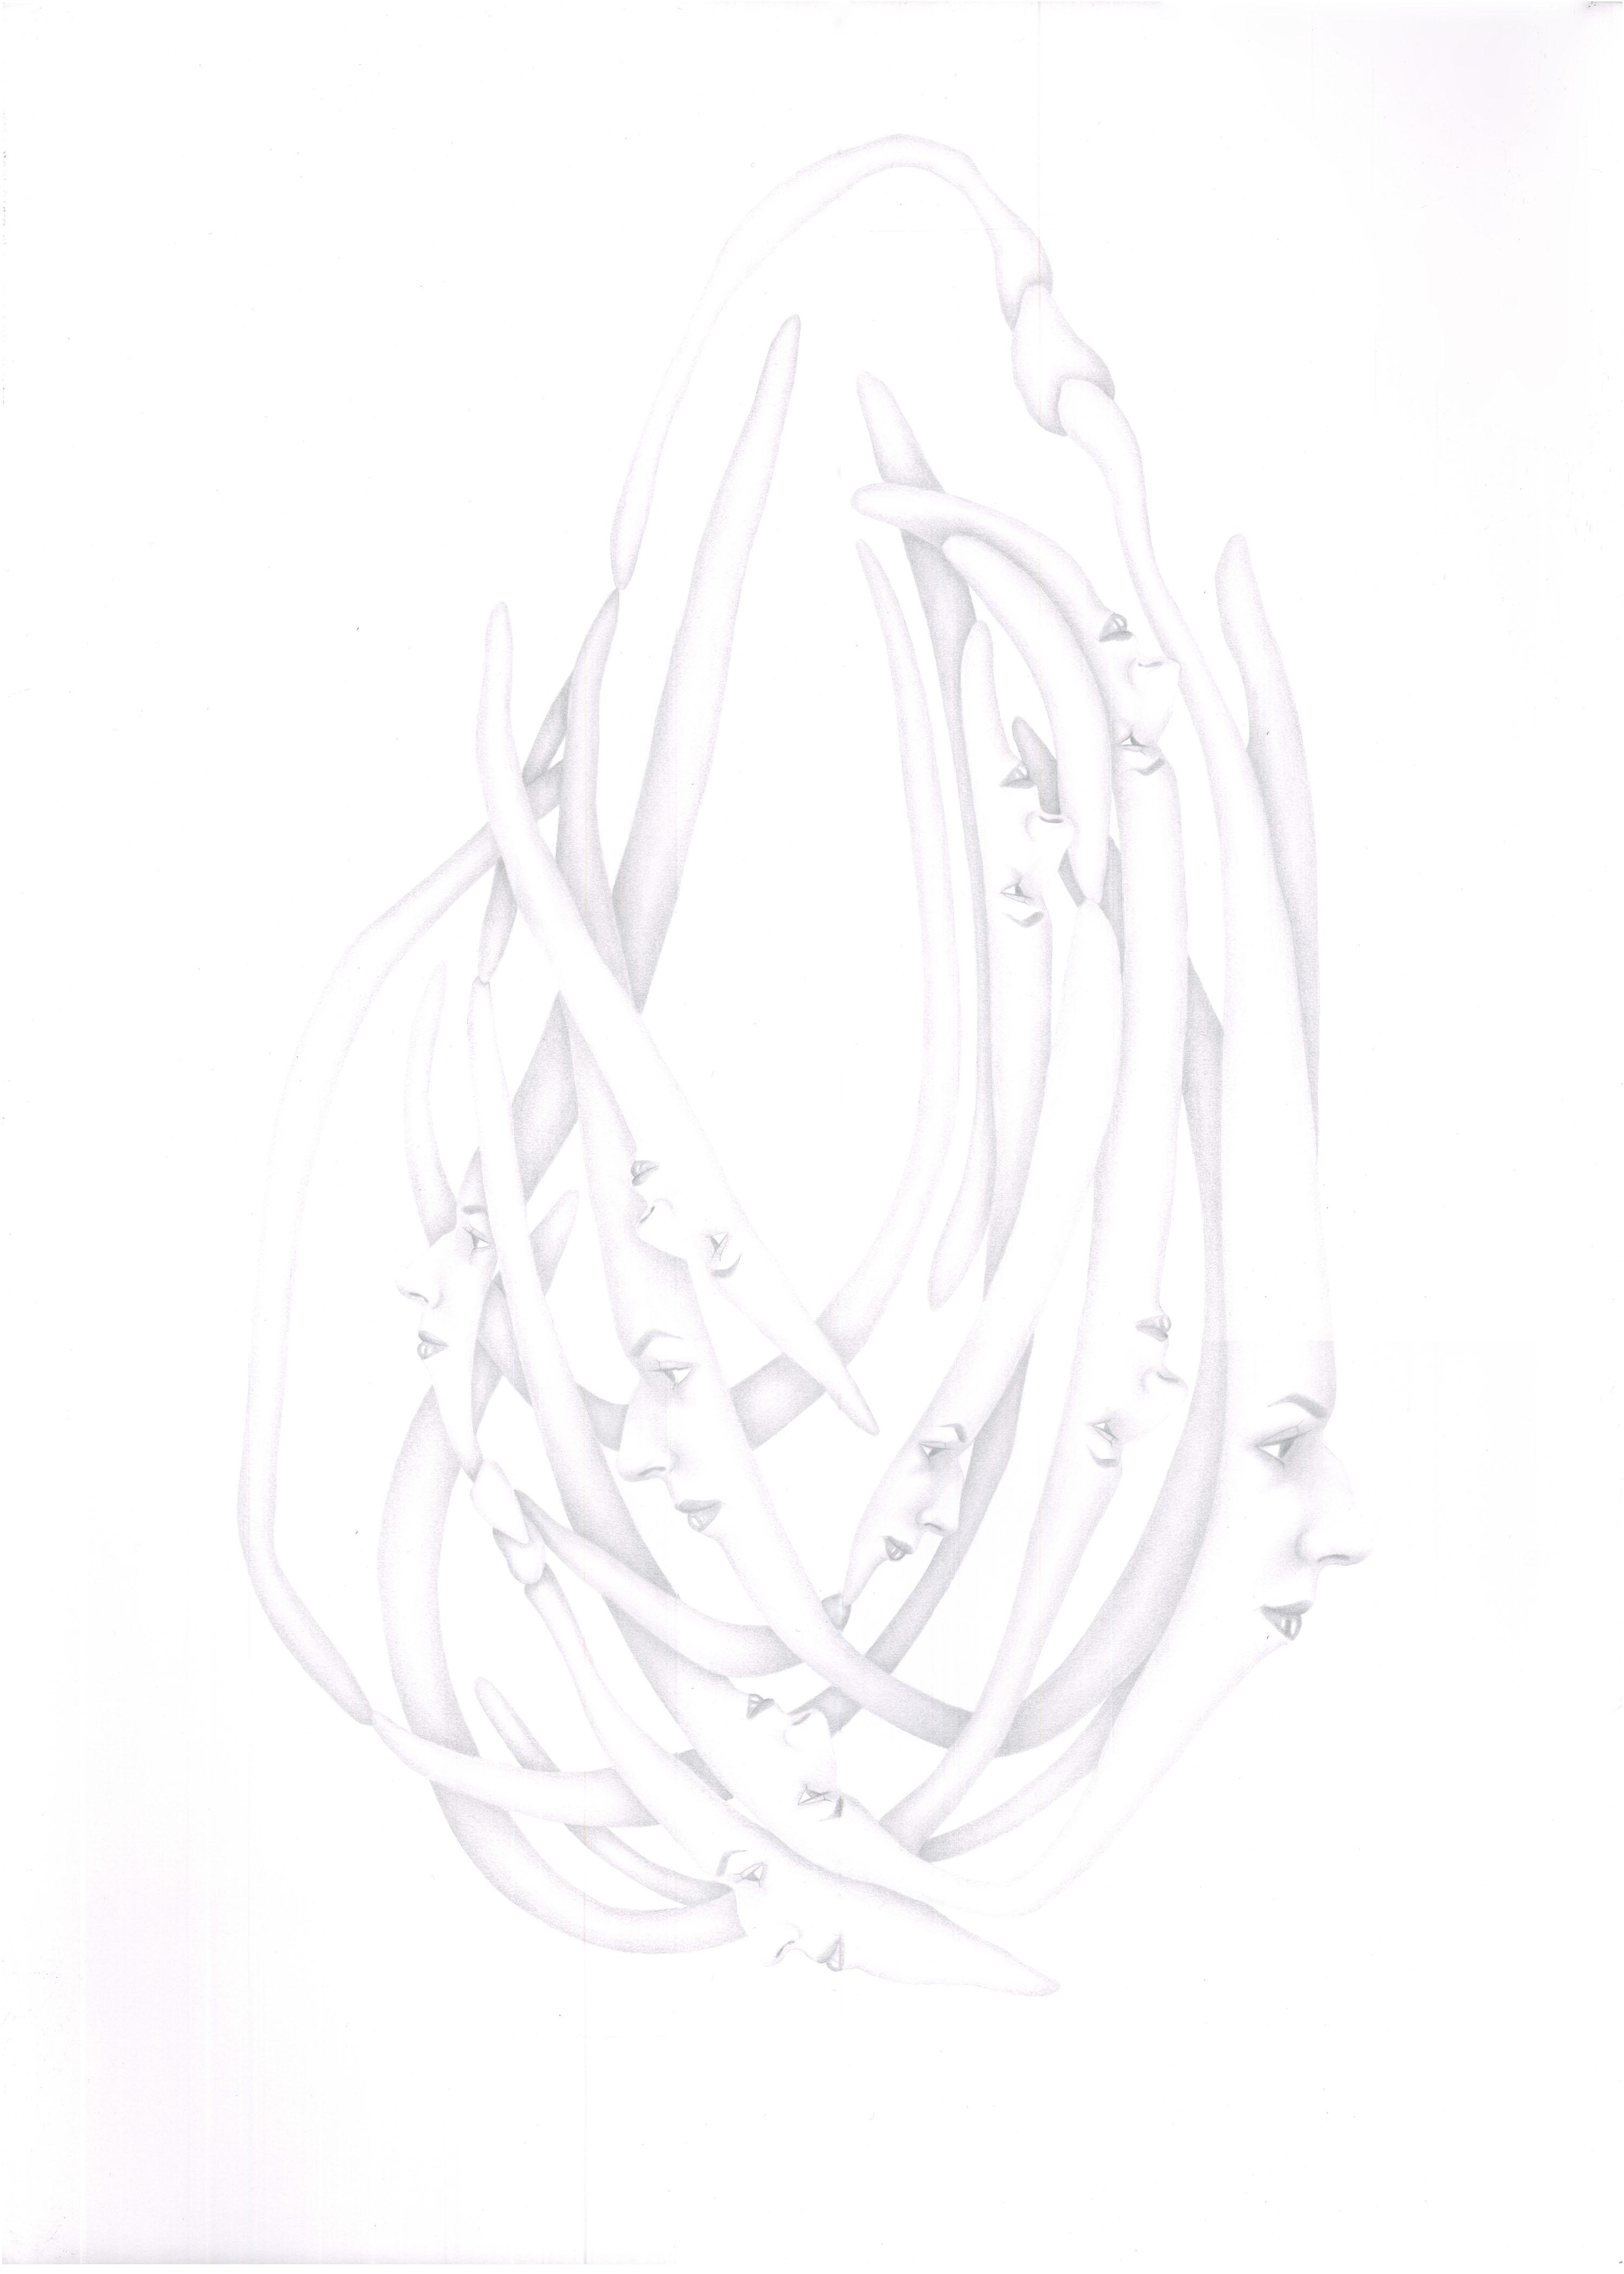 15-Sahar Safarian,  Sometimes No.1, 2013, Pencil On Cardboard, 70 x 50 cm.